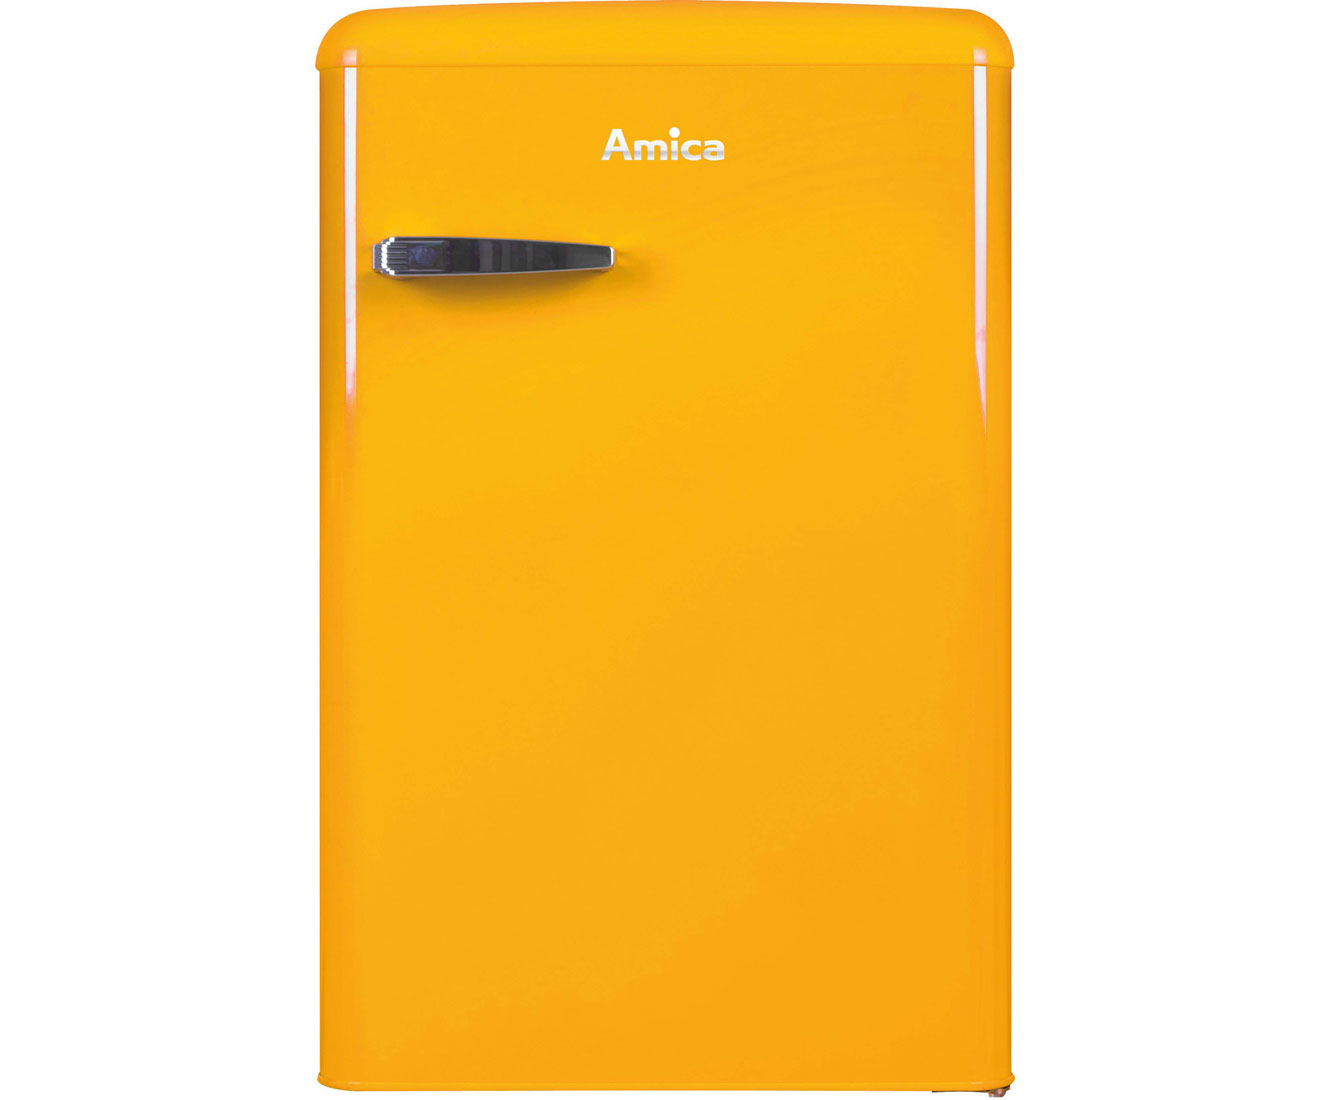 Retro Kühlschrank Amica Creme : Retro kühlschrank günstig retro kühlschrank rot typen best retro